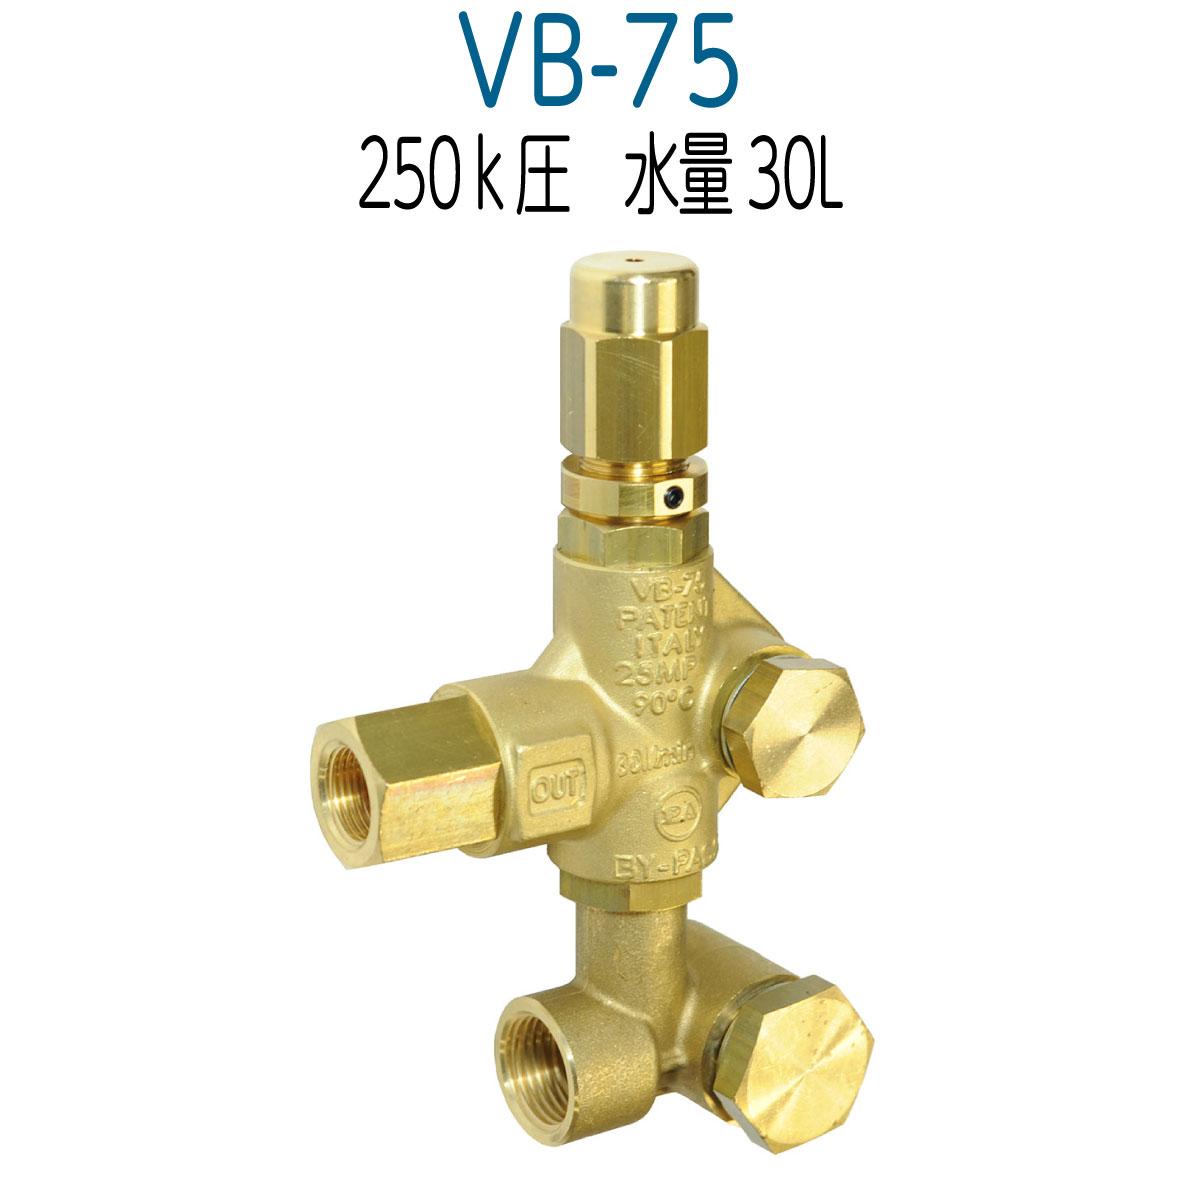 VB-75 アンローダ 期間限定お試し価格 新色 精和産業